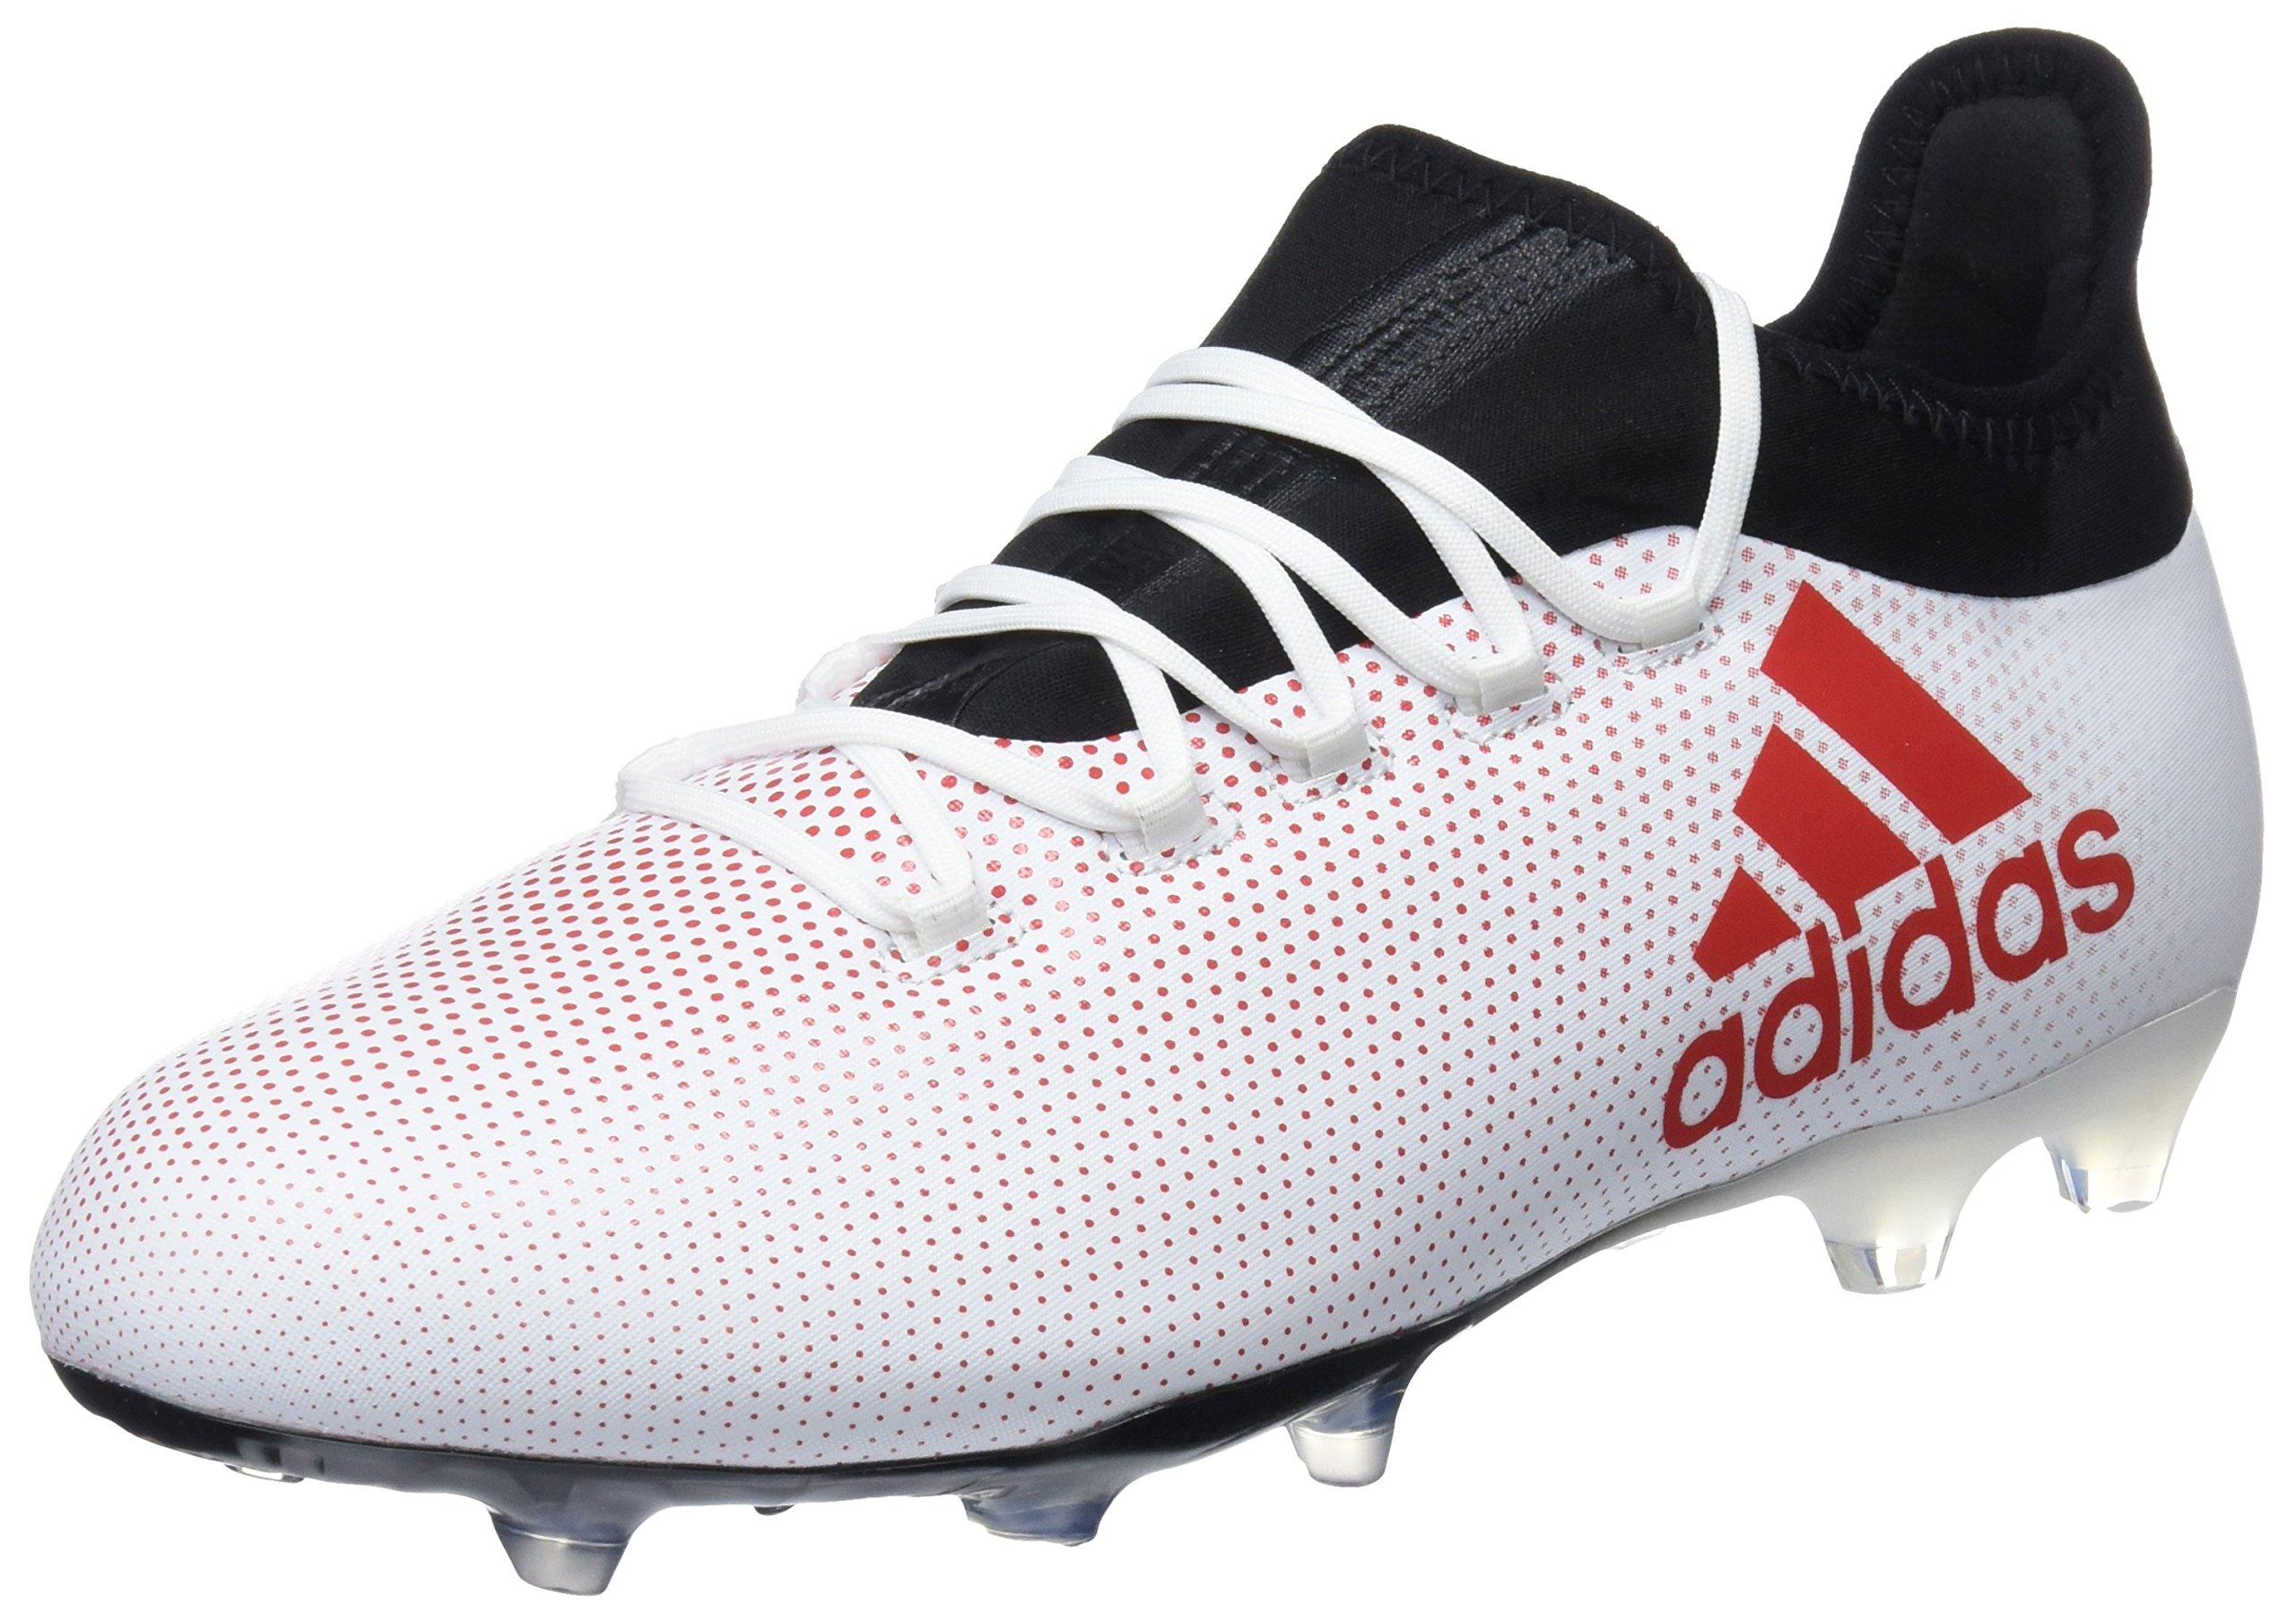 Eu HommeMulticoloregreyreacorcblack42 Football Adidas De 2 17 X FgChaussures cAS54Lj3Rq